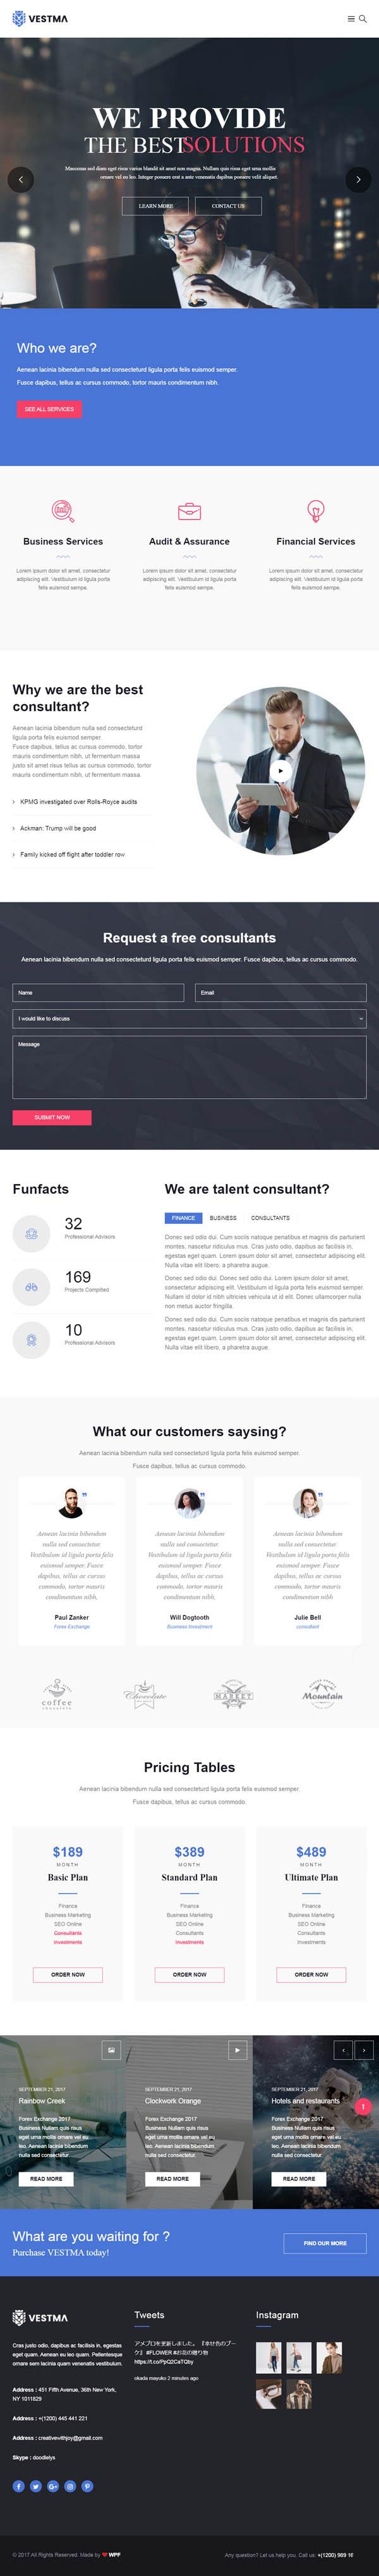 VestMa - Business, Consulting, Corporate WordPress Theme